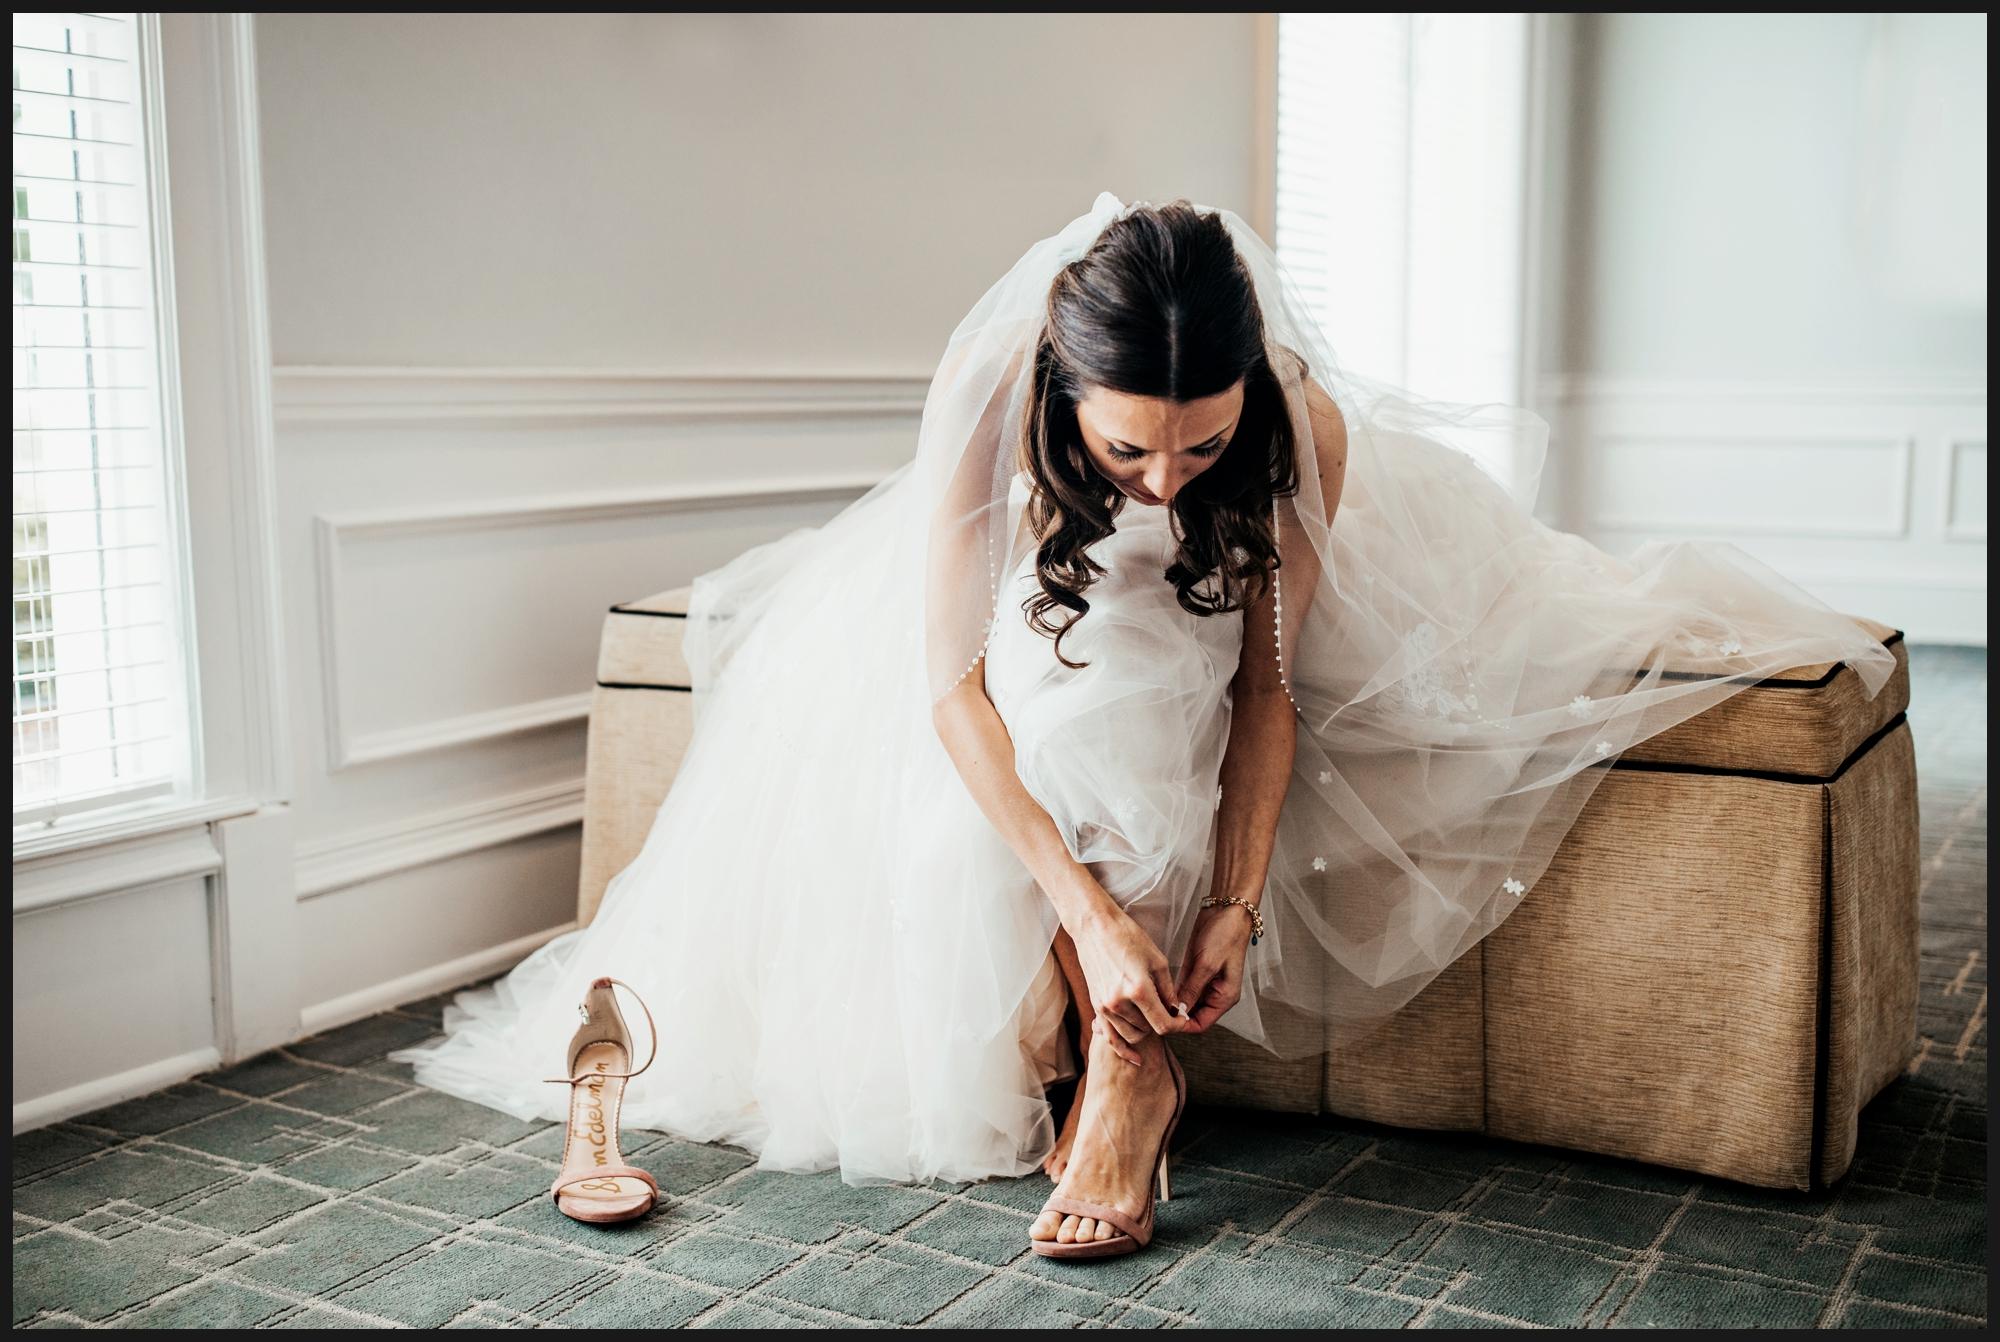 Orlando-Wedding-Photographer-destination-wedding-photographer-florida-wedding-photographer-hawaii-wedding-photographer_0200.jpg